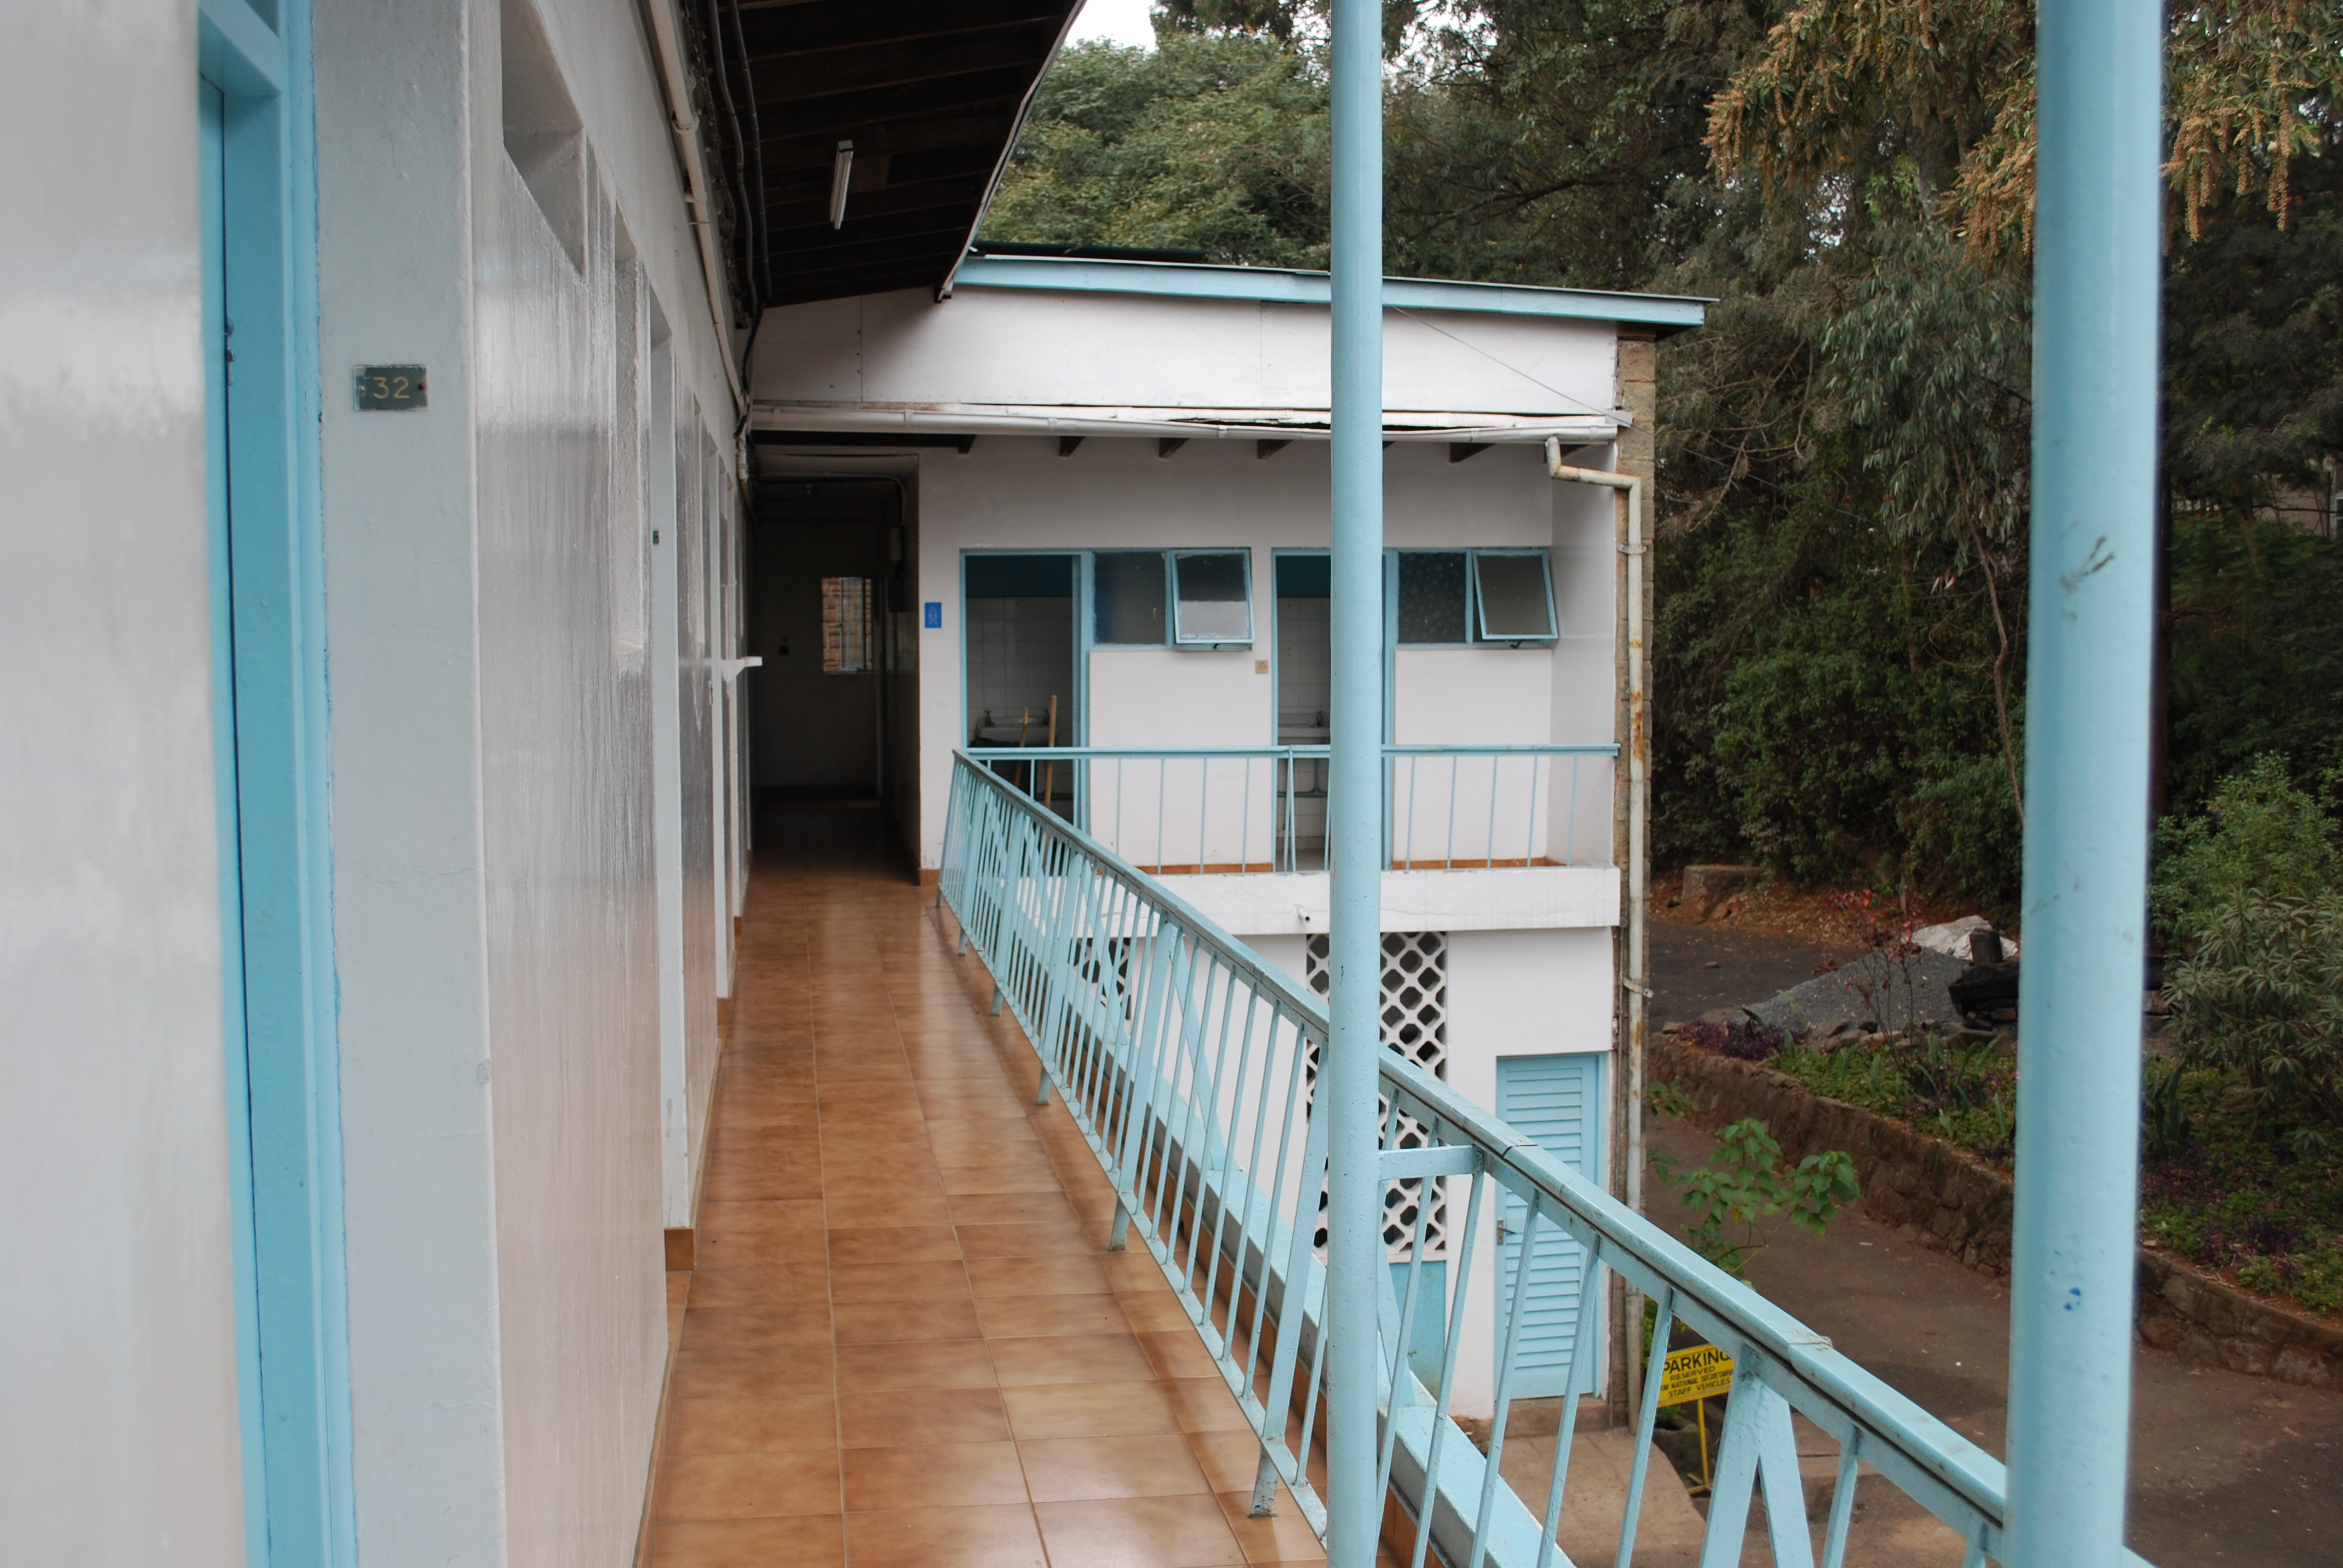 YMCA Nairobi (Central Branch)